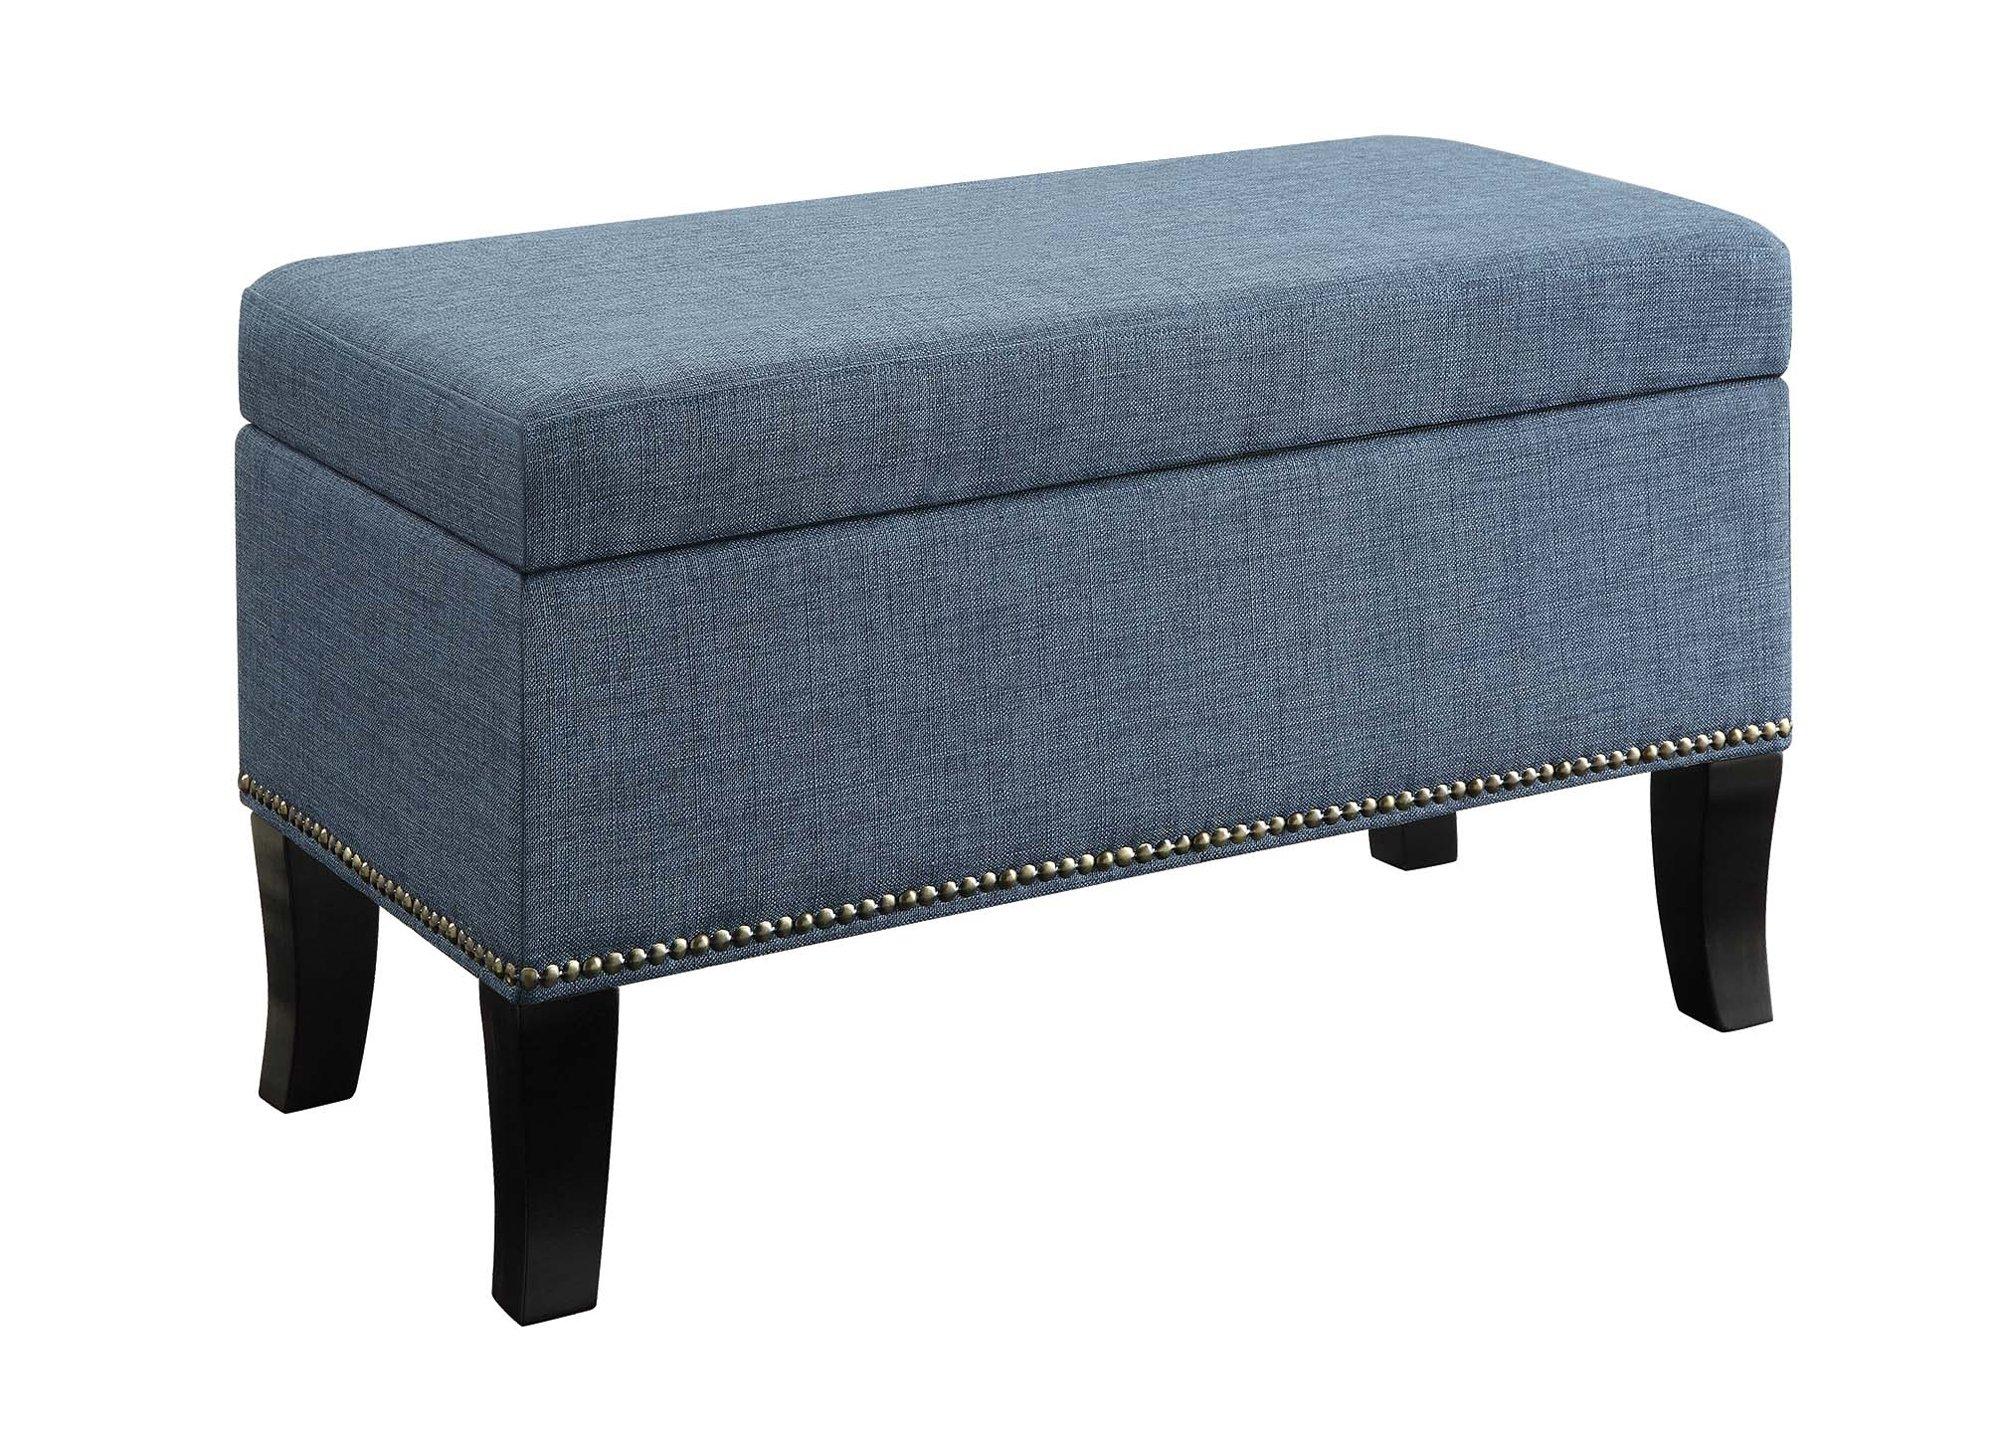 Convenience Concepts 161322FBE Designs4Comfort Winslow Storage Ottoman, Blue Fabric